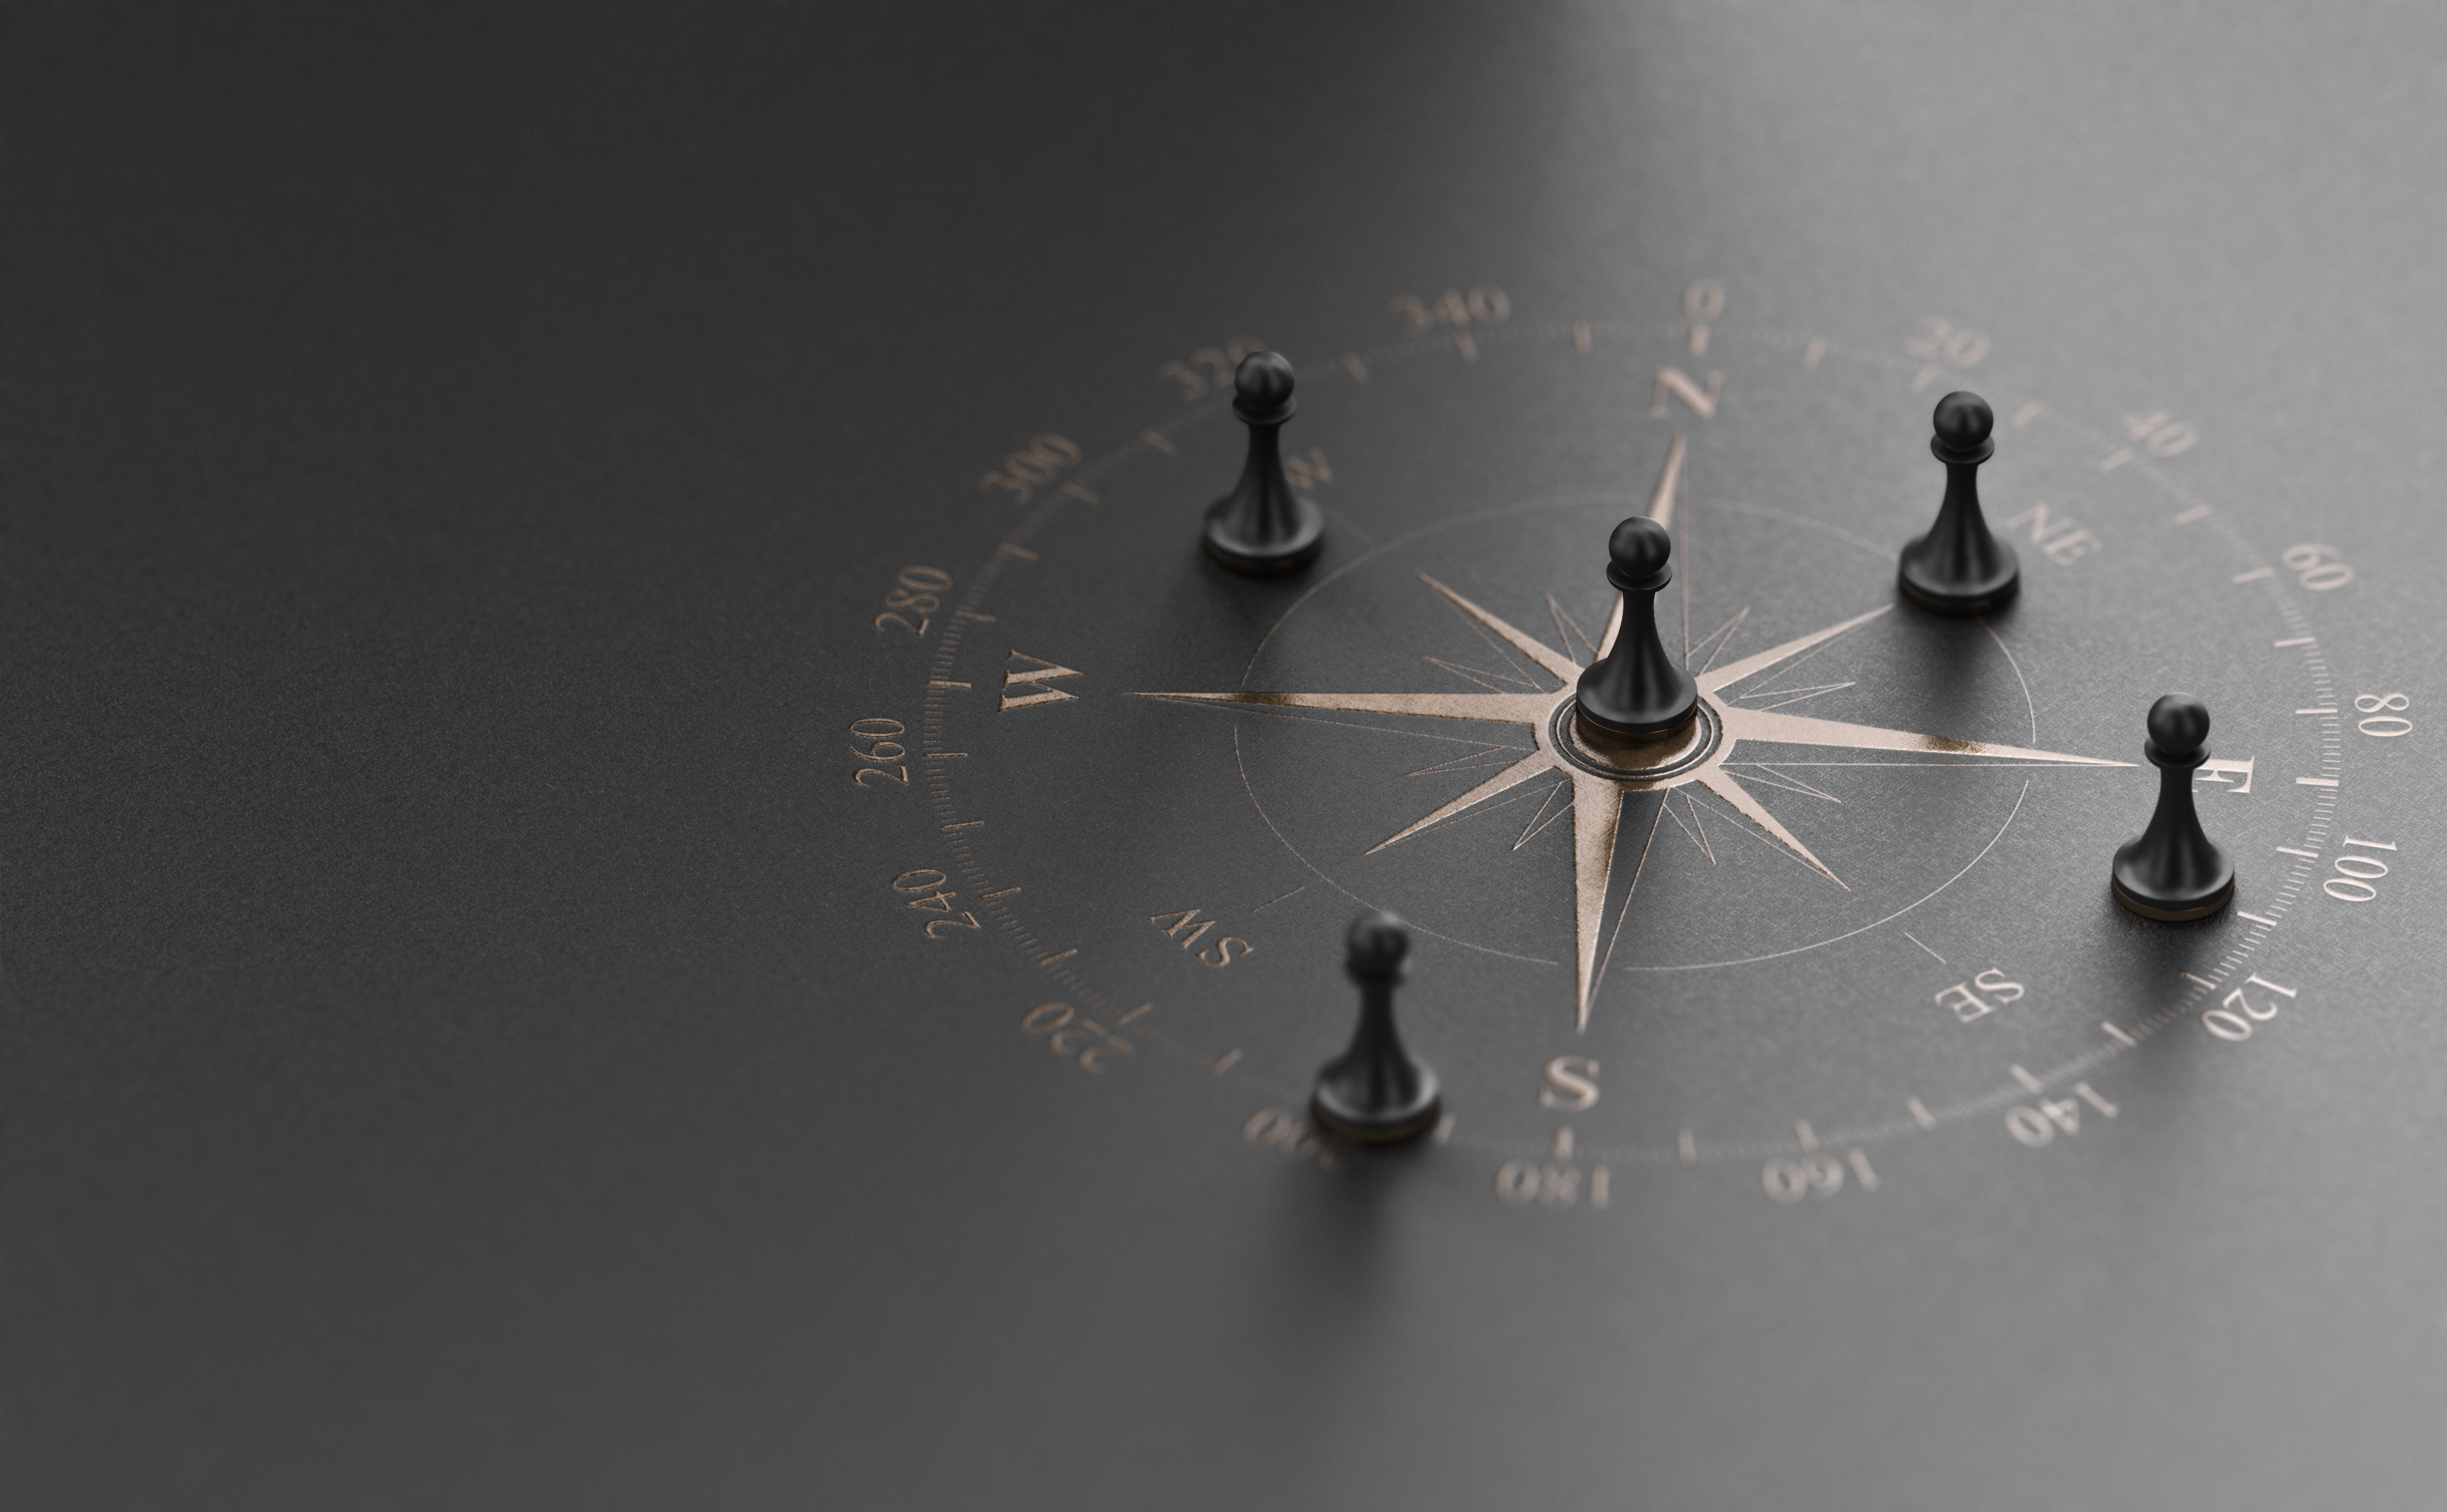 strategic-business-advice-concept-G8WMSKP